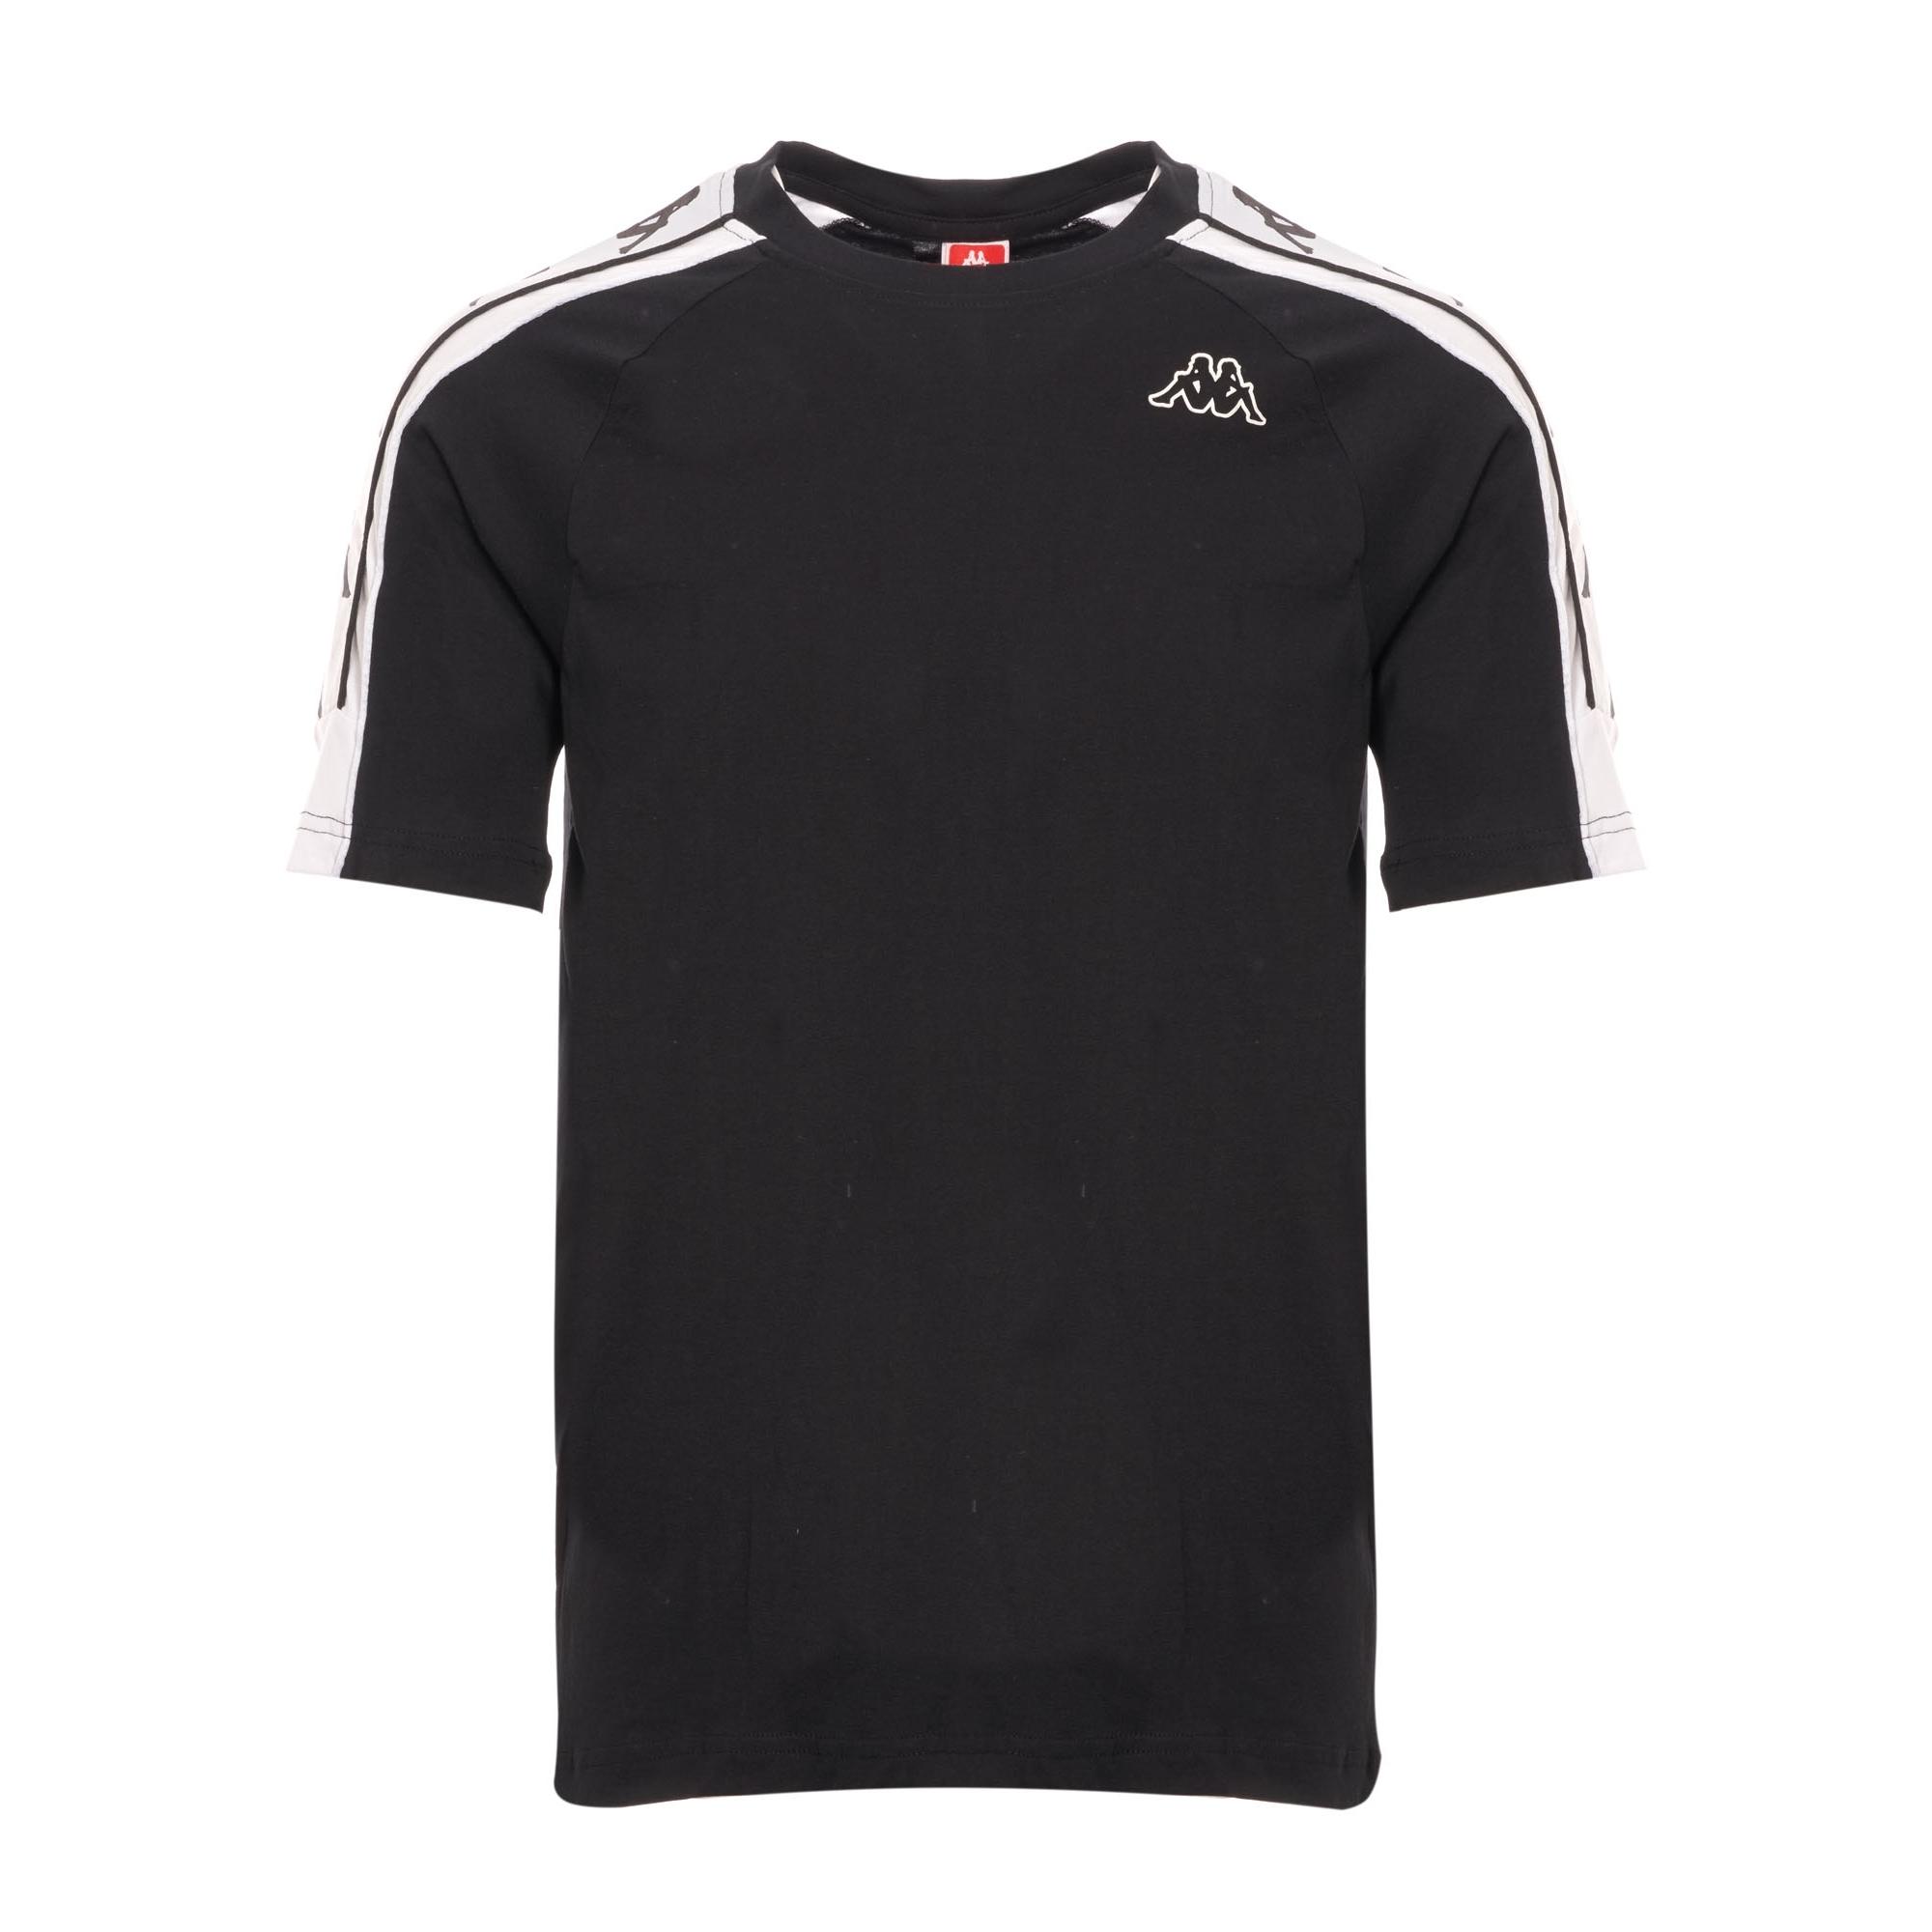 fbe93e79 Kappa Banda Taped T-Shirt   Black & White   304I050-903